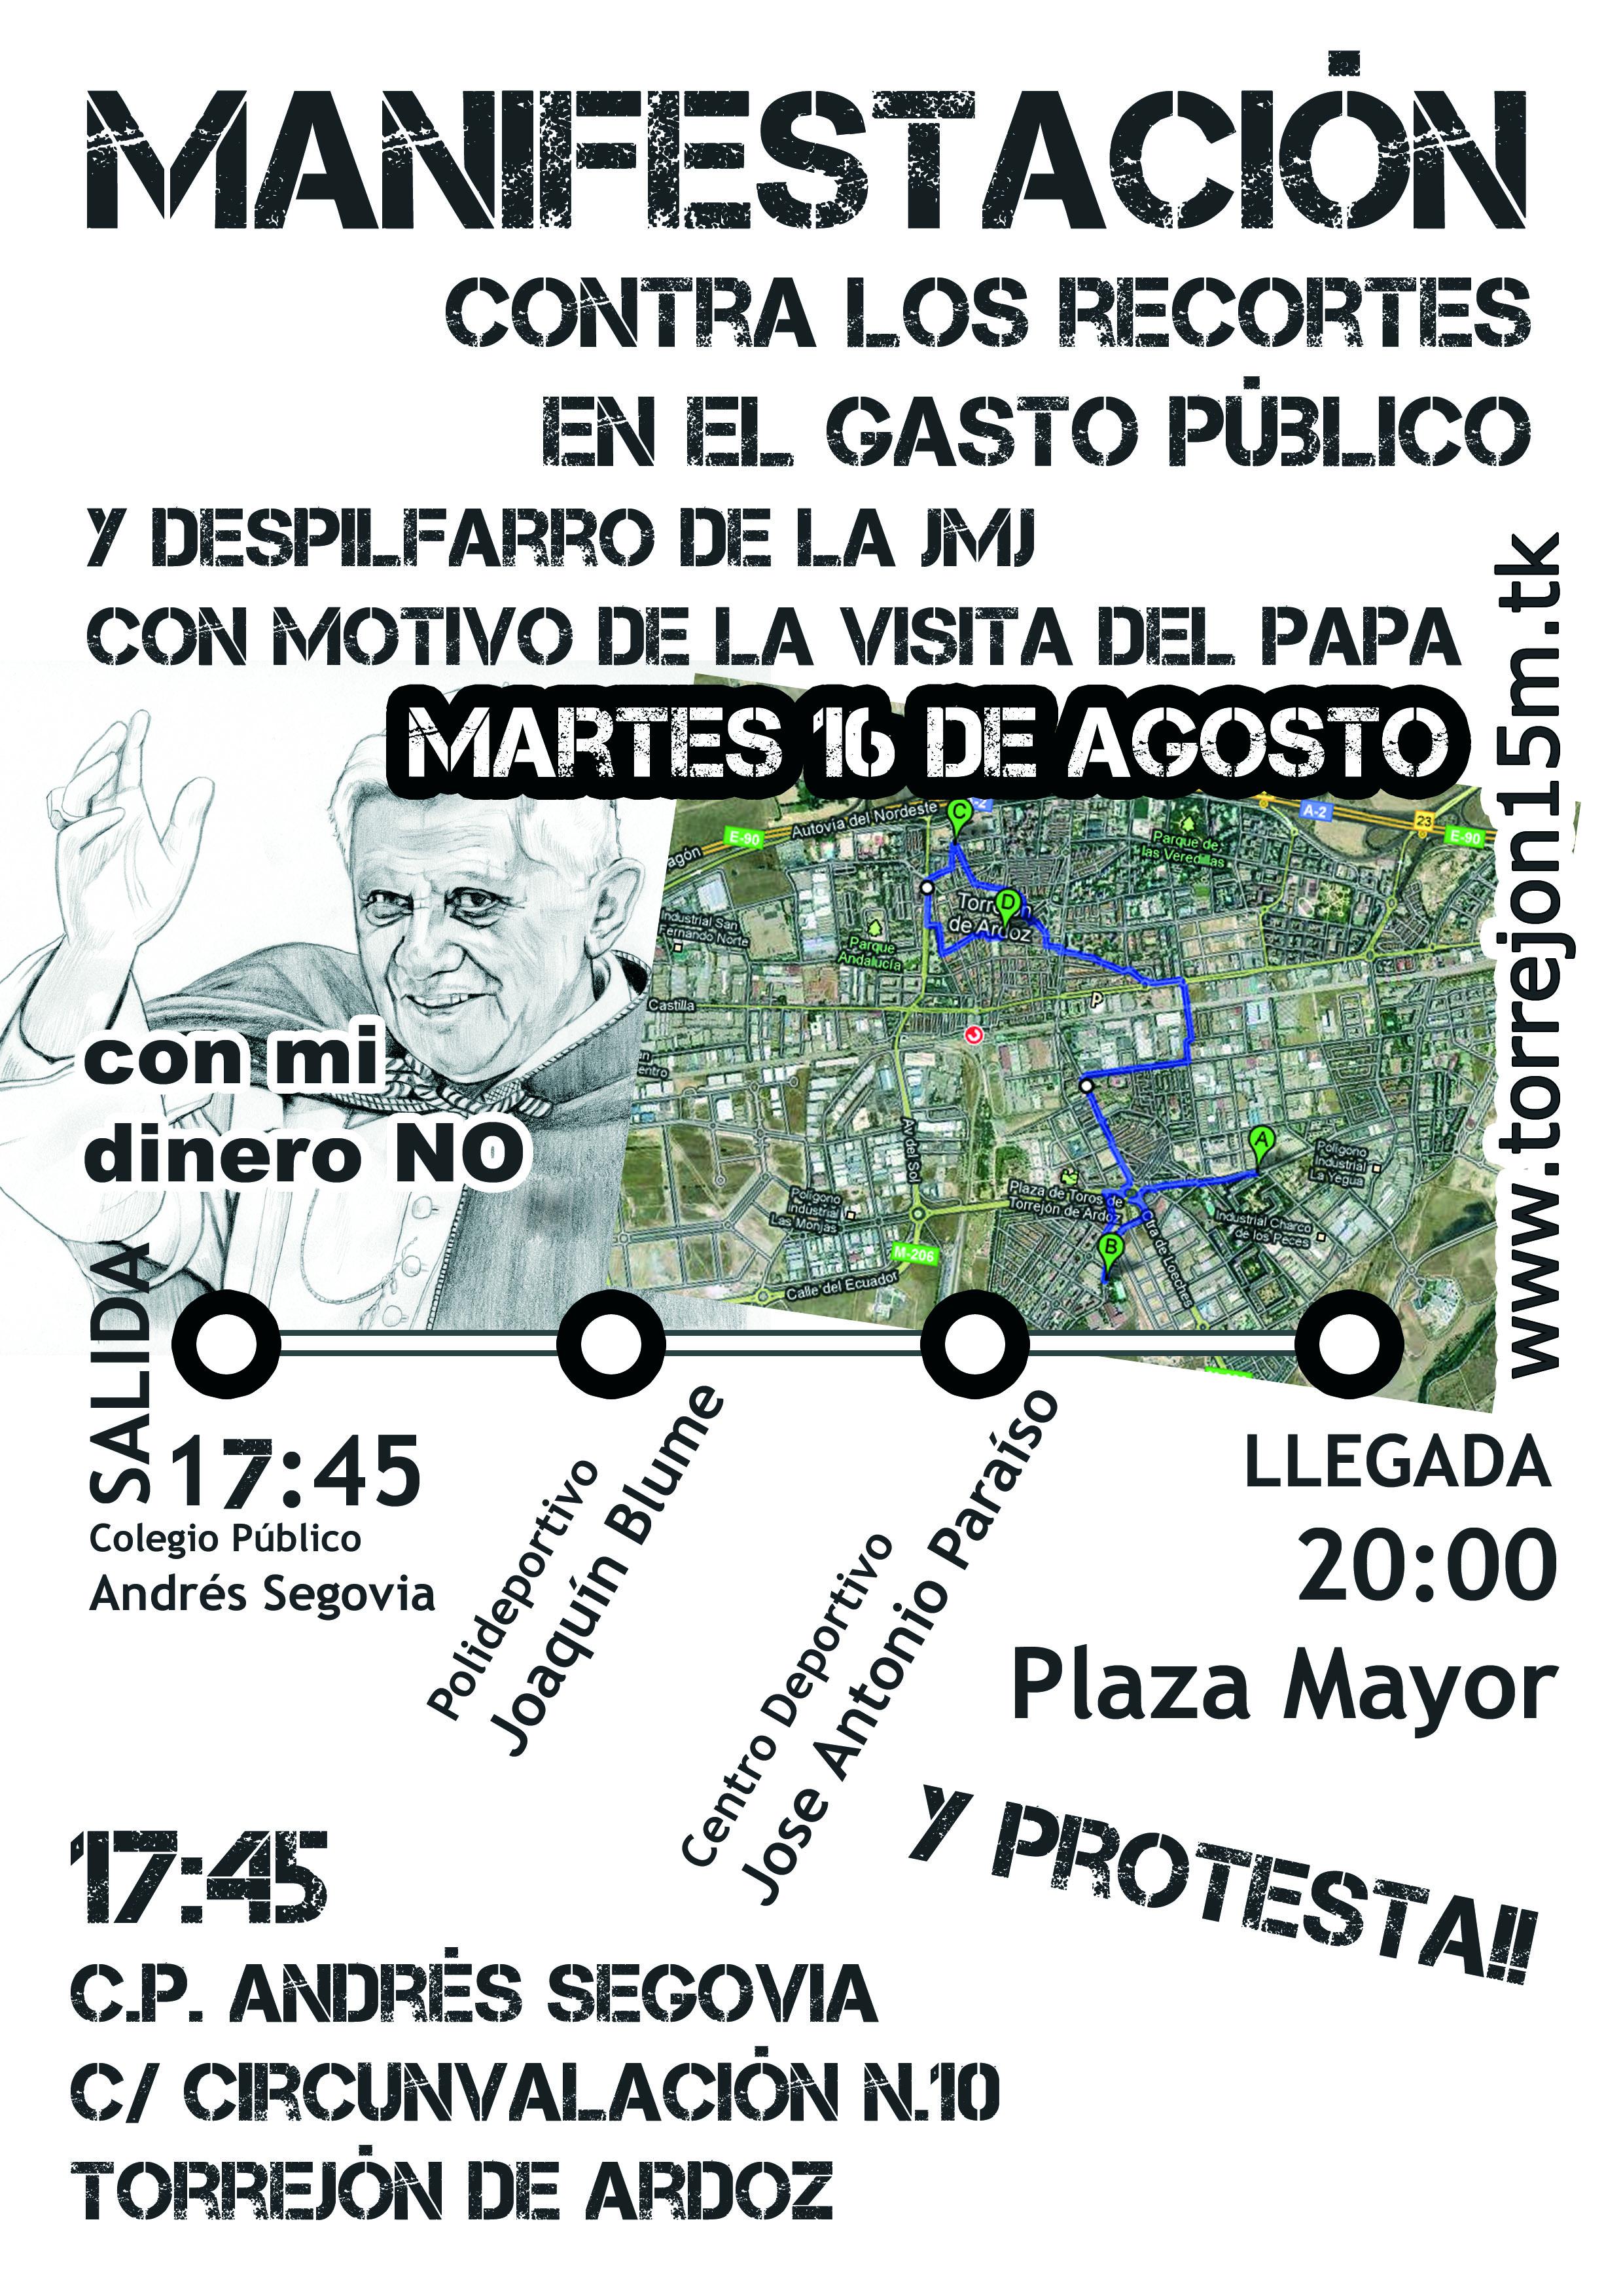 Manifestación martes 16 de agosto de 2011